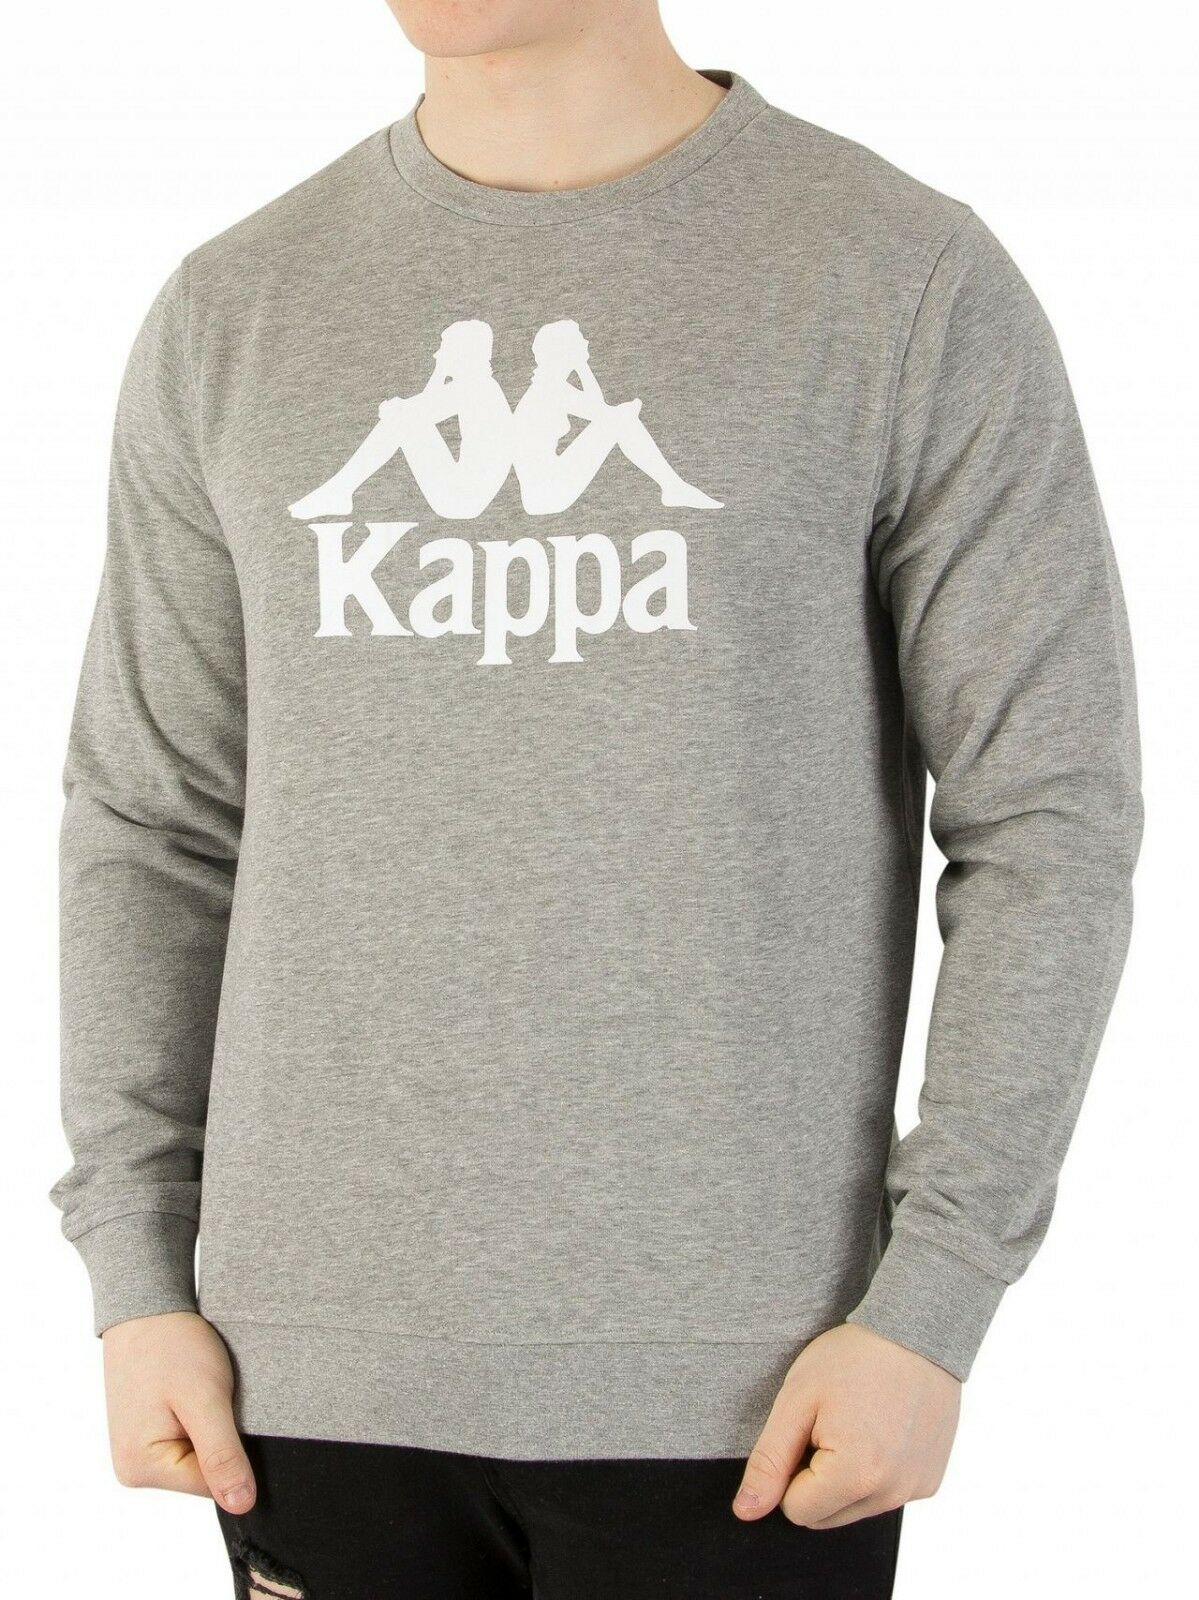 KAPPA AUTHENTIC Zemin shirt grigio con logo 303wiv0